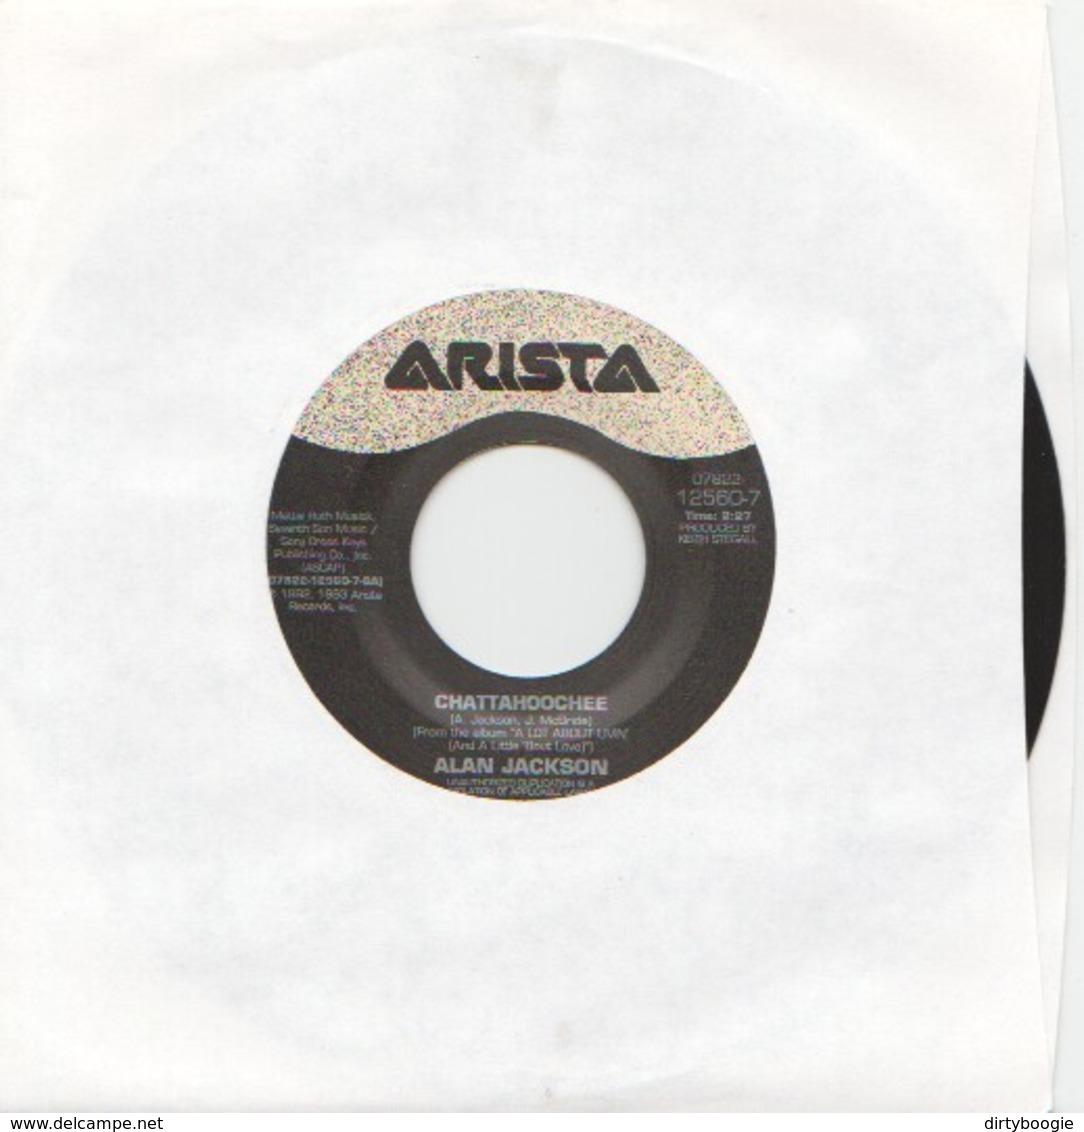 Alan JACKSON - Chattahoochee - 45t - Country & Folk